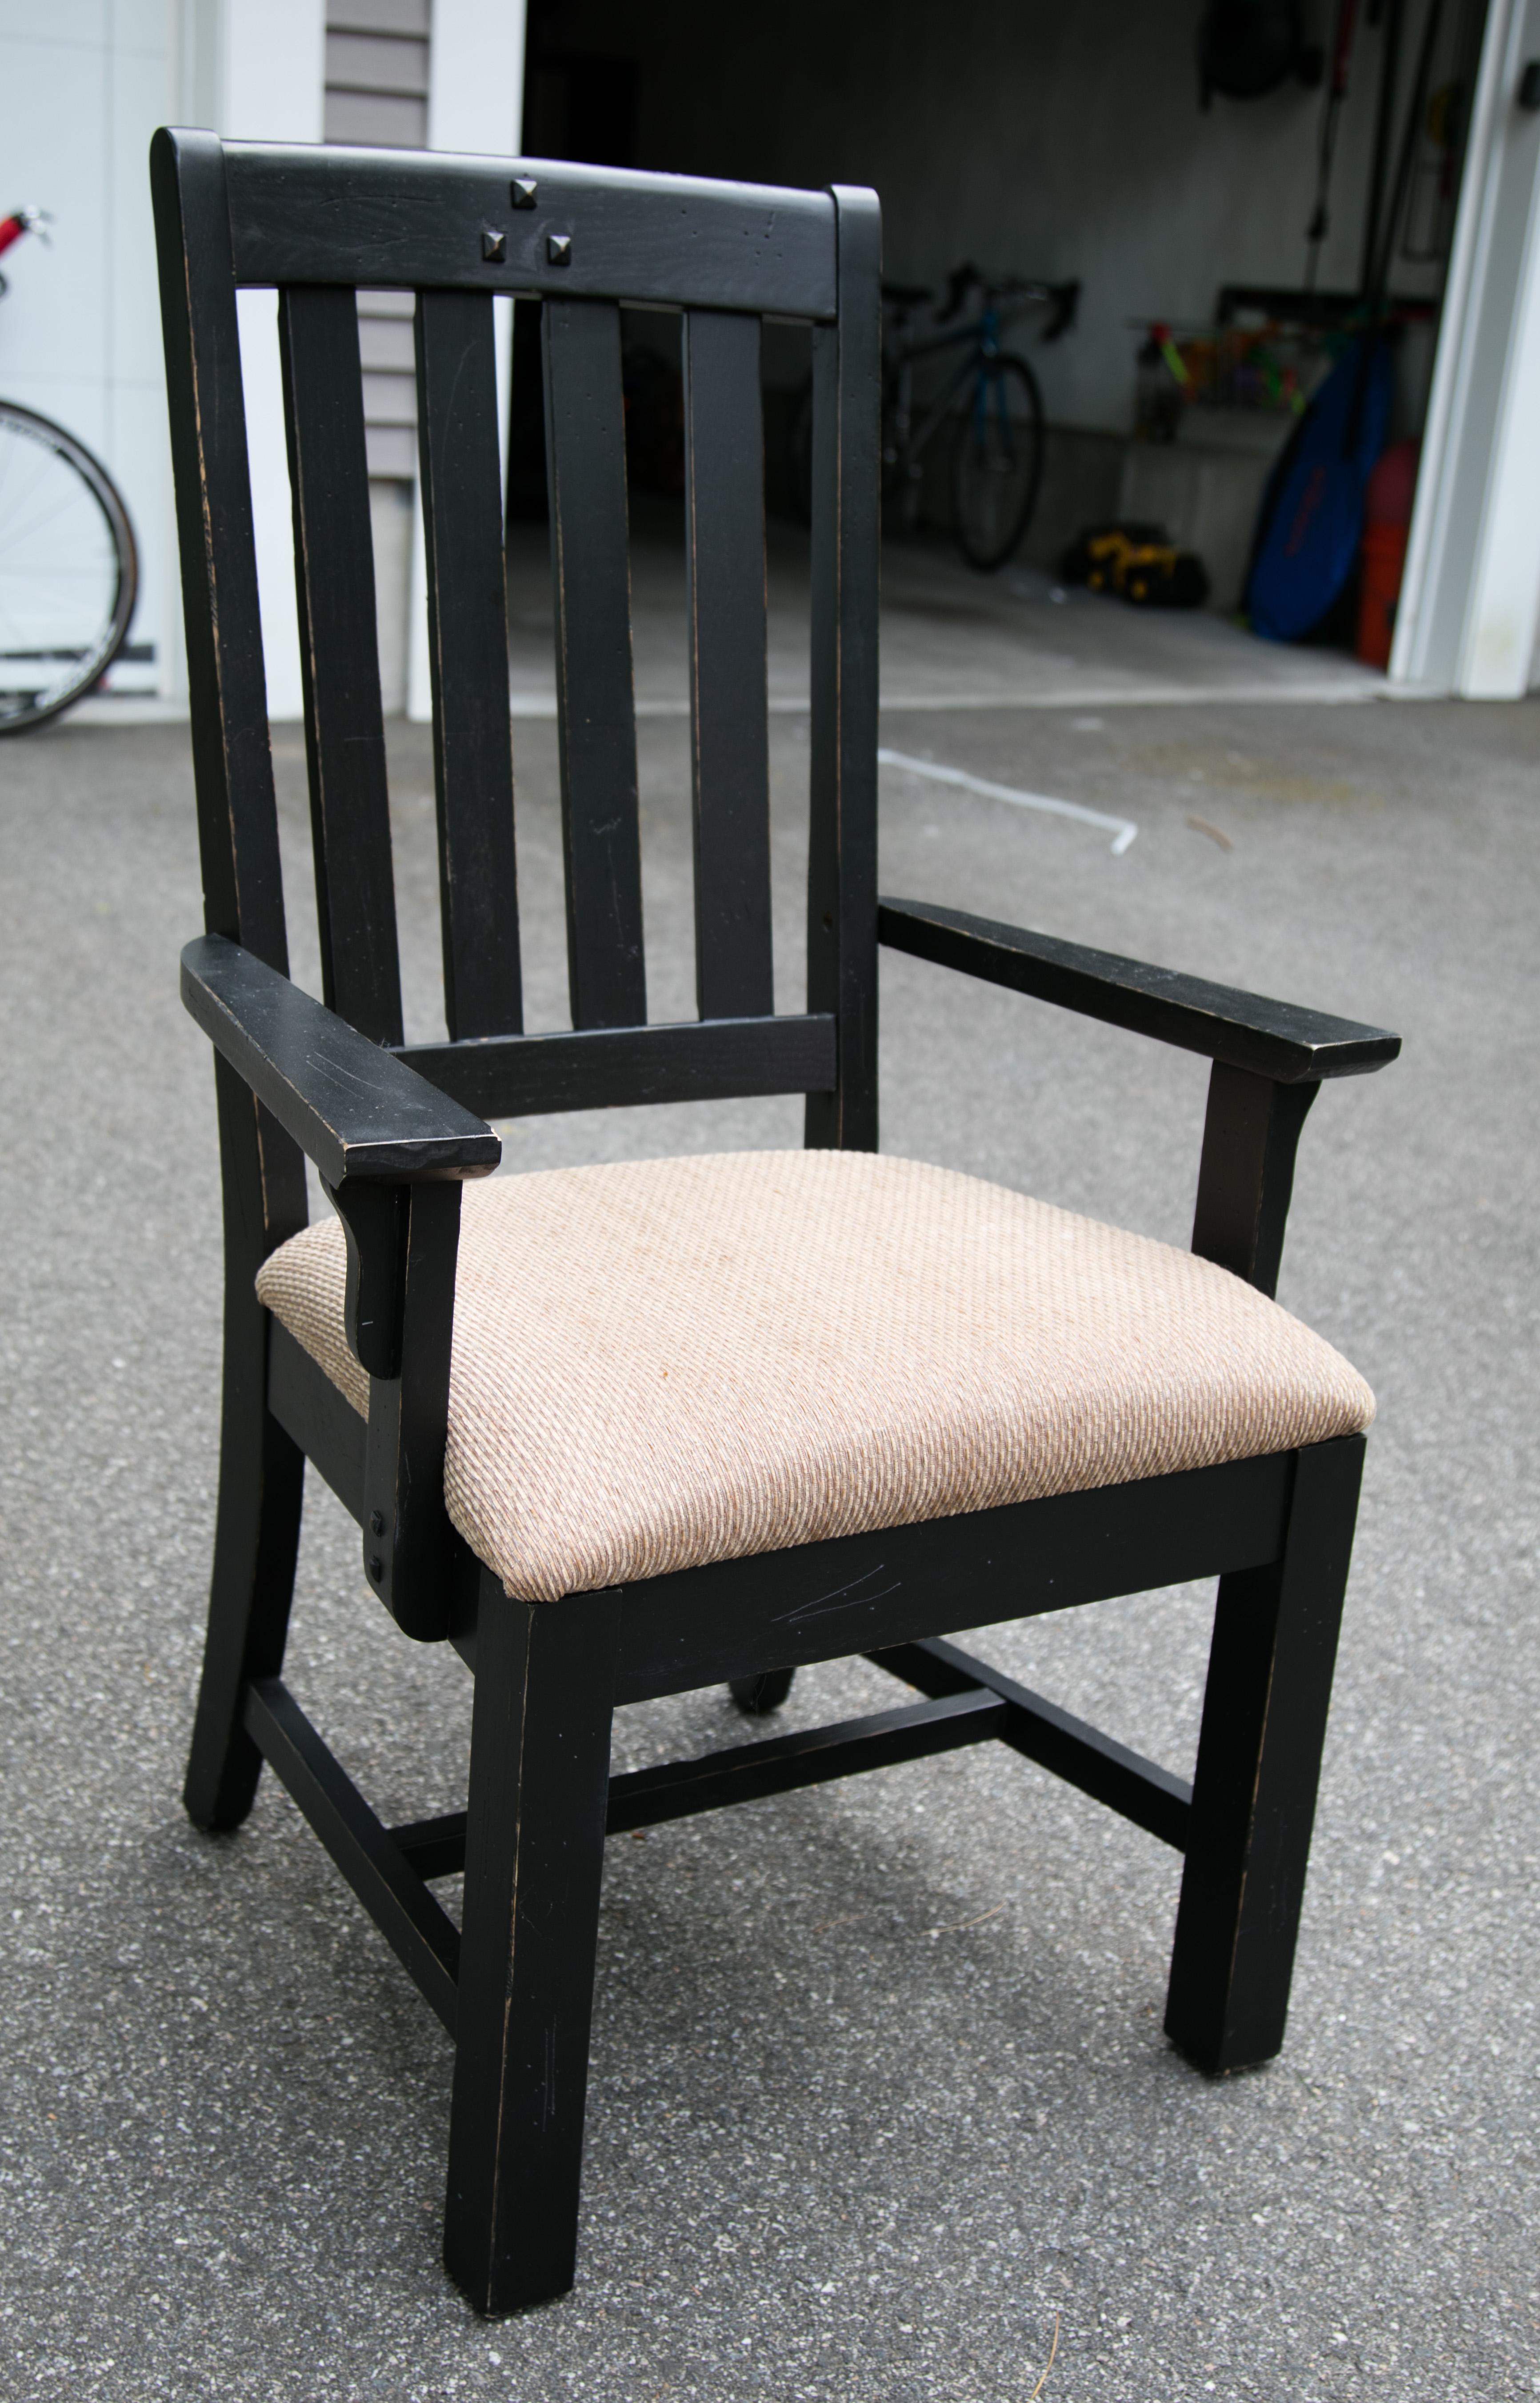 Heirloom Rustic Trestle Farm Table & 10 Chairs